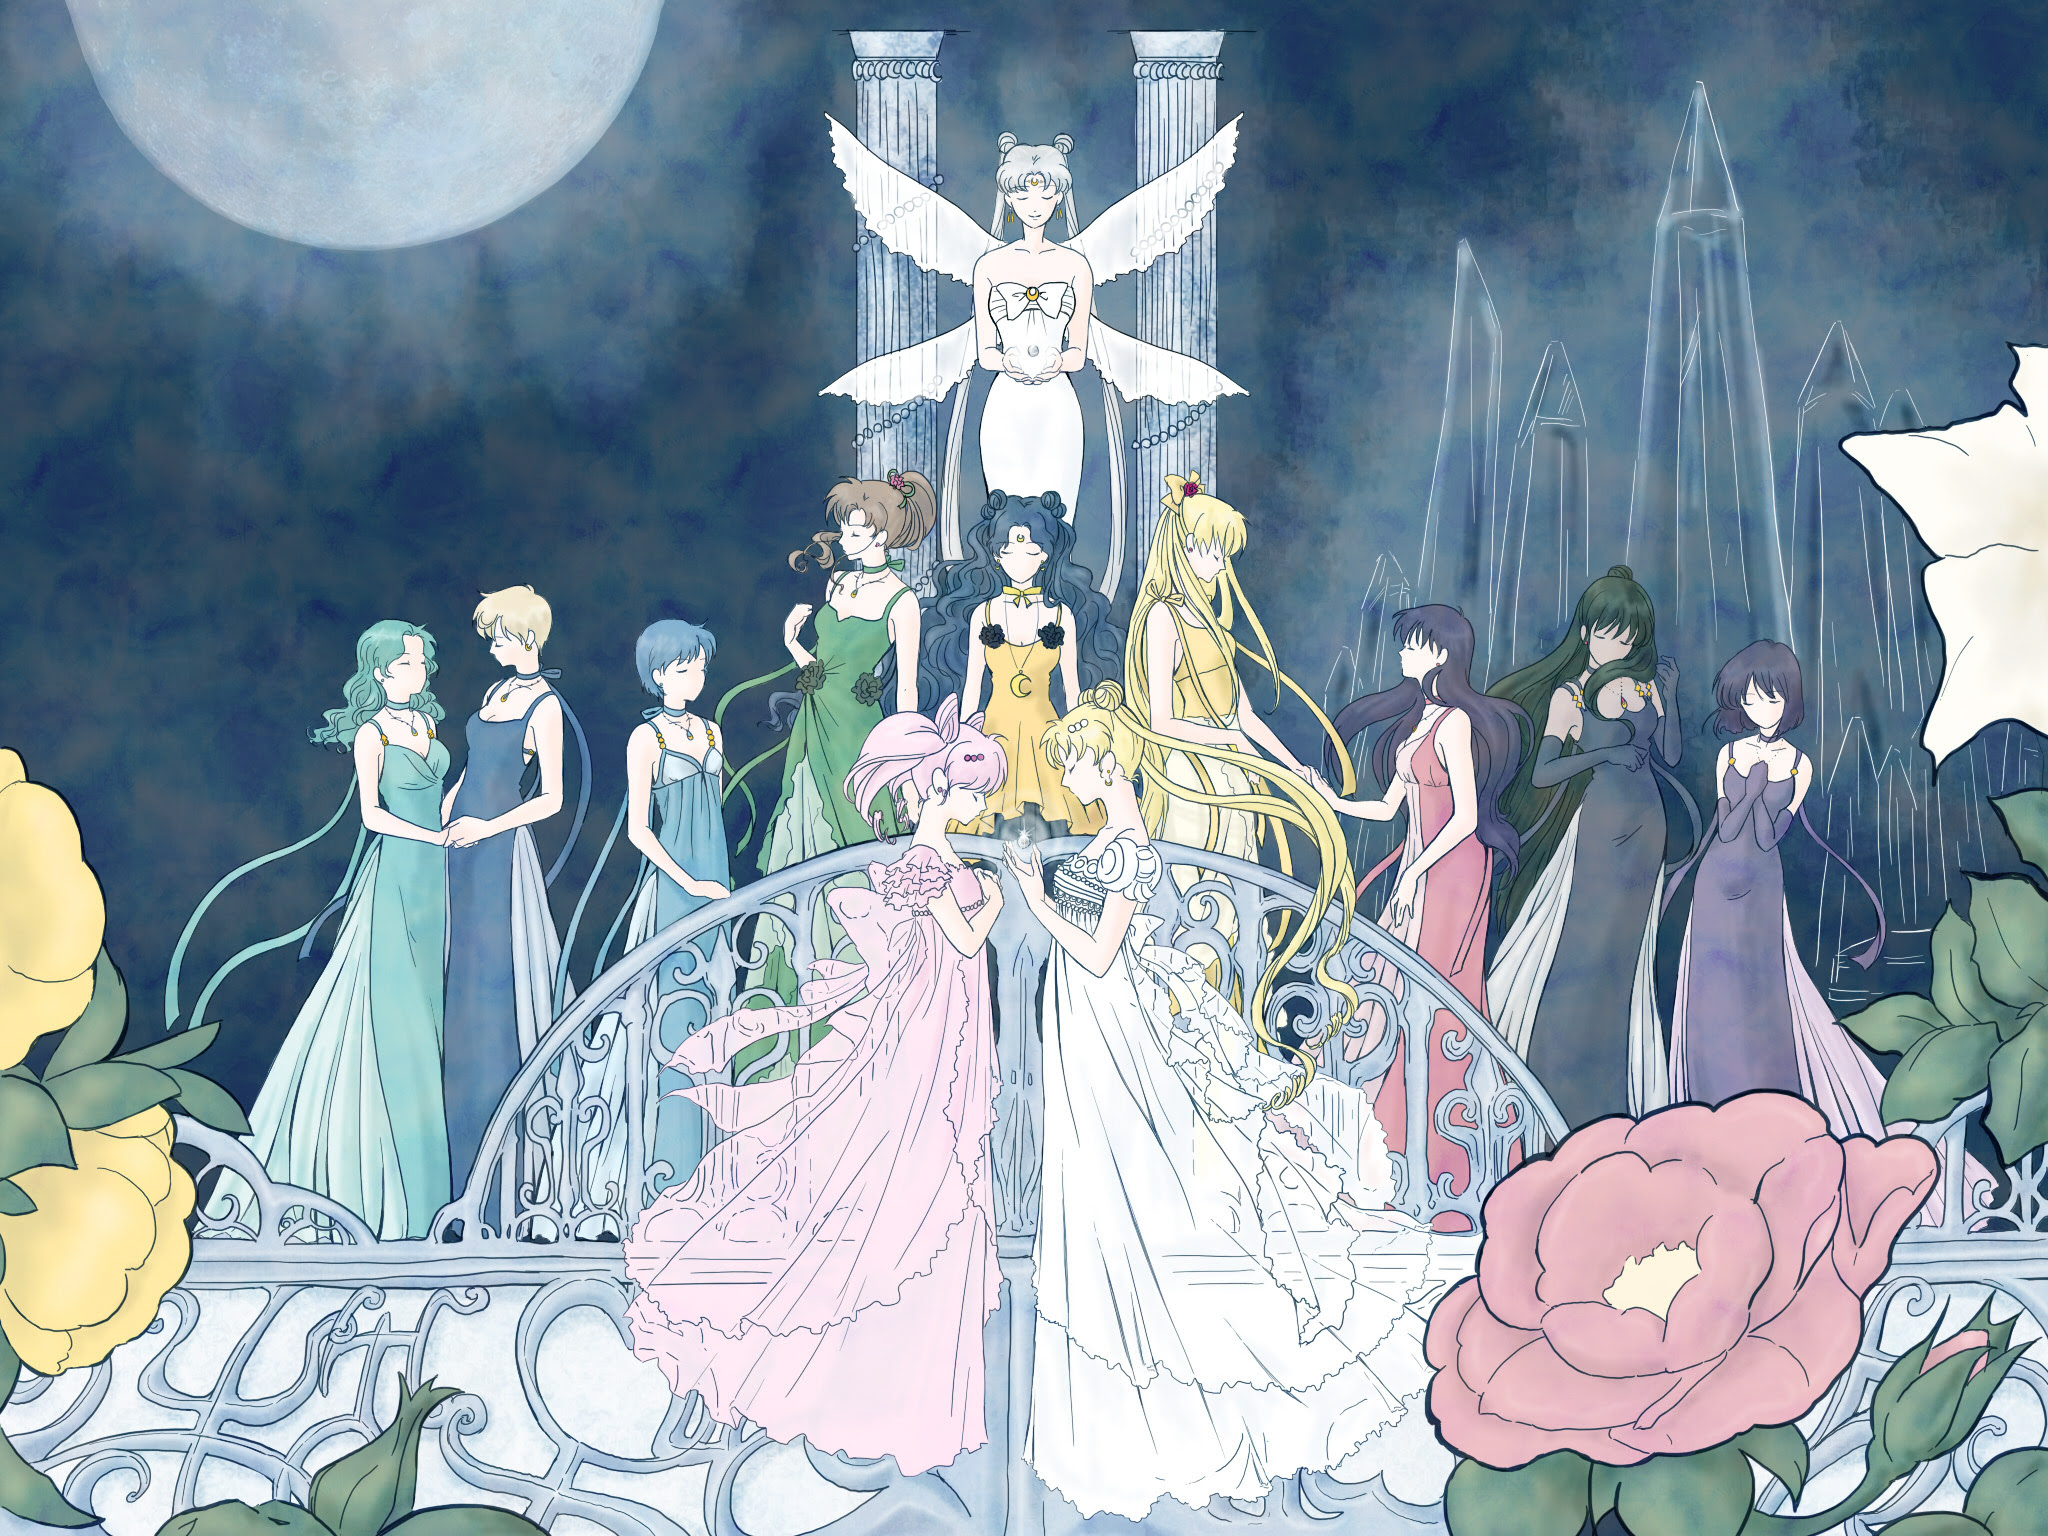 Sailormoon セーラームーン 壁紙 37468157 ファンポップ